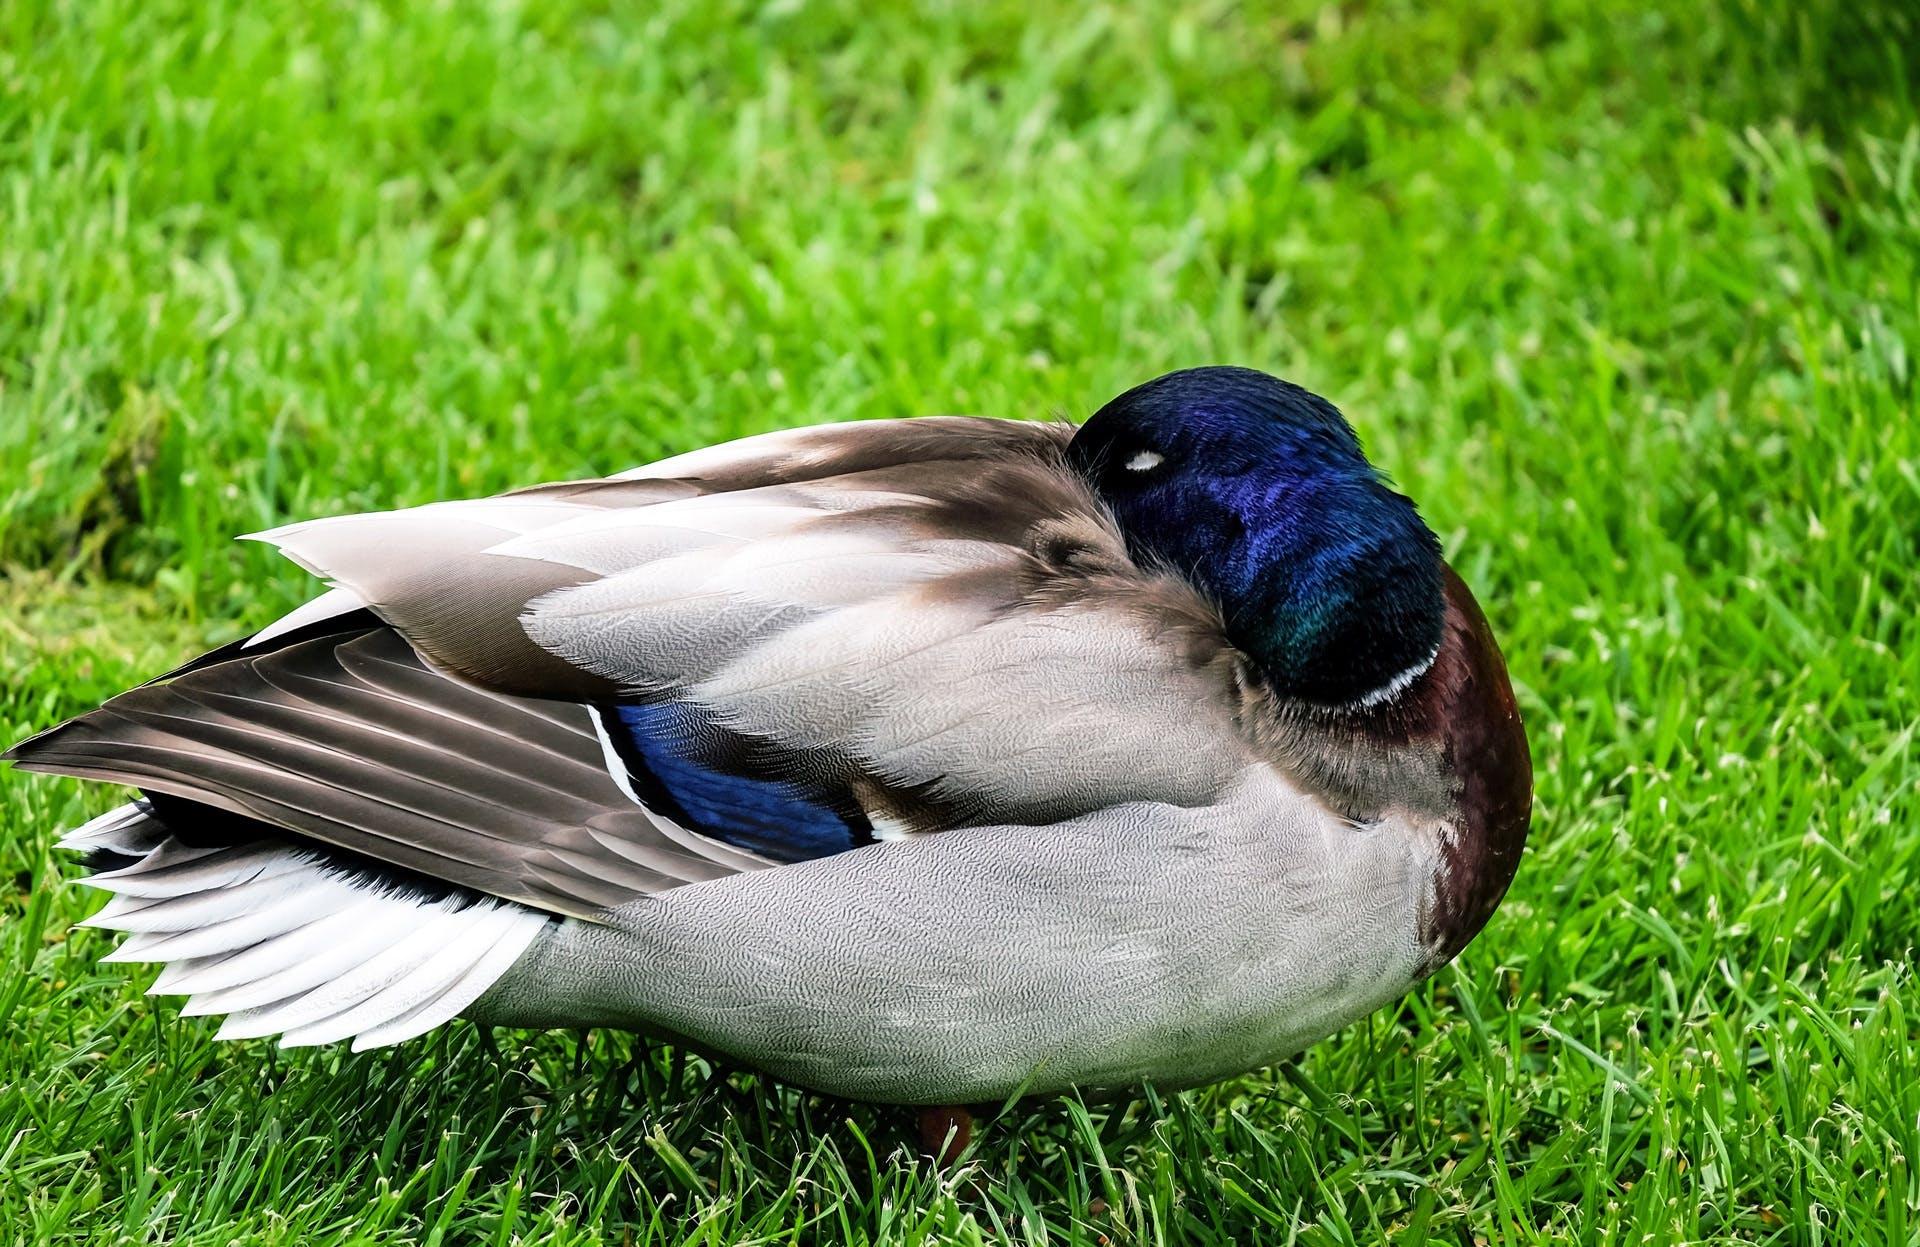 Free stock photo of nature, bird, animal, grass